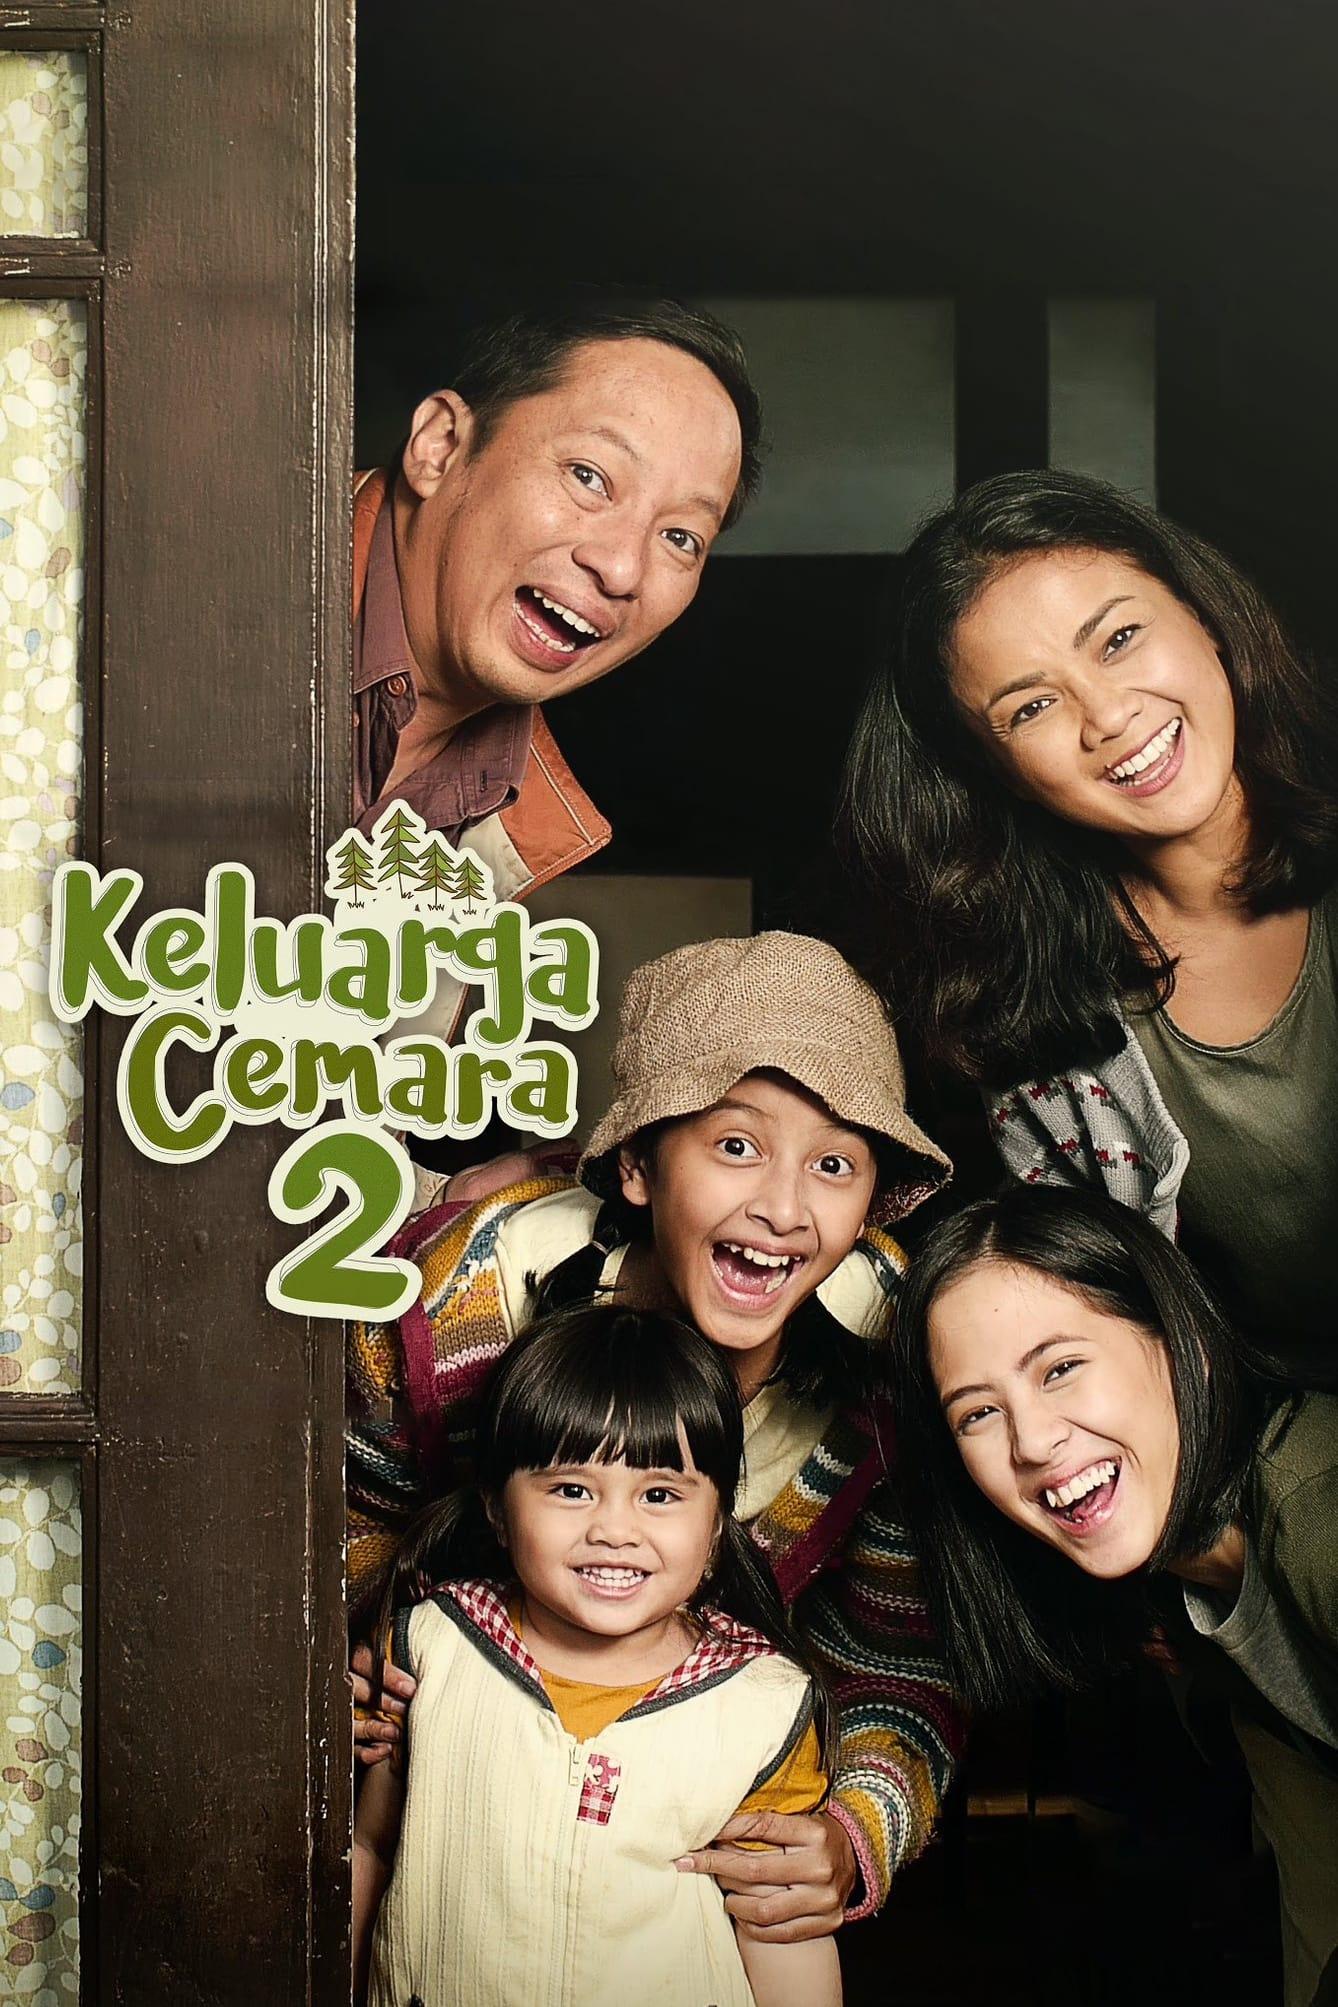 Cemara's Family 2